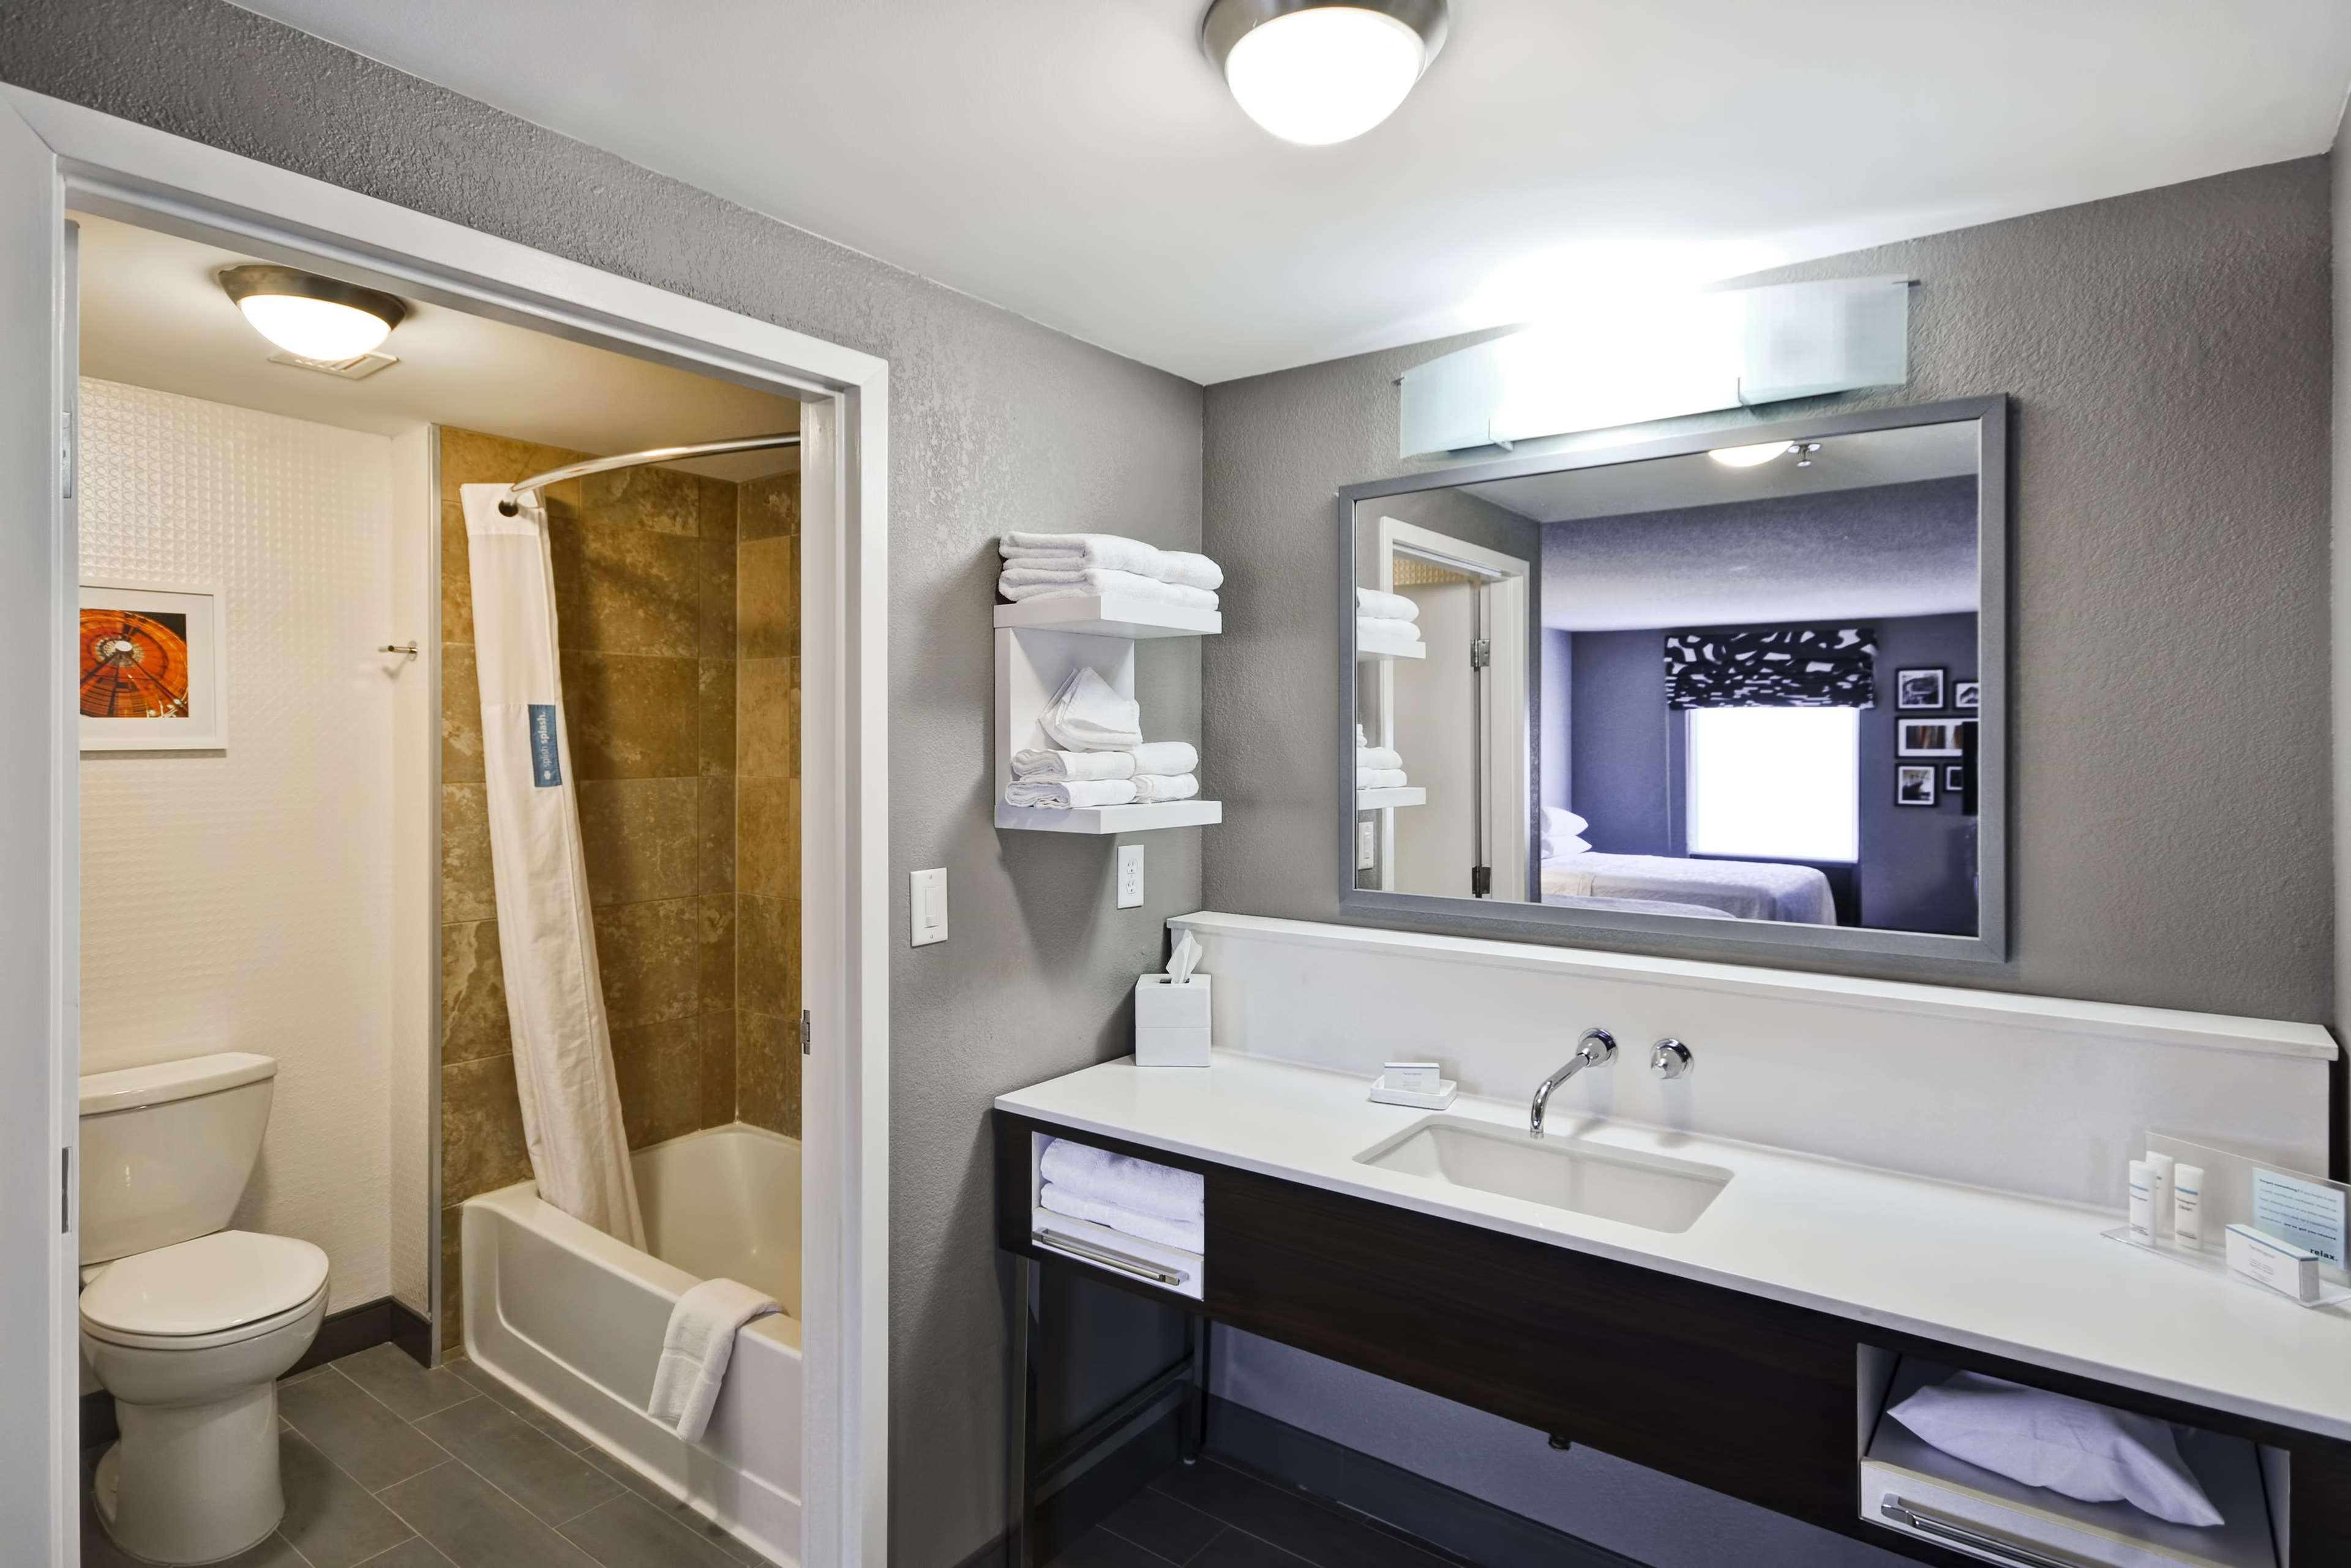 Hampton Inn & Suites Columbus-Easton Area image 32